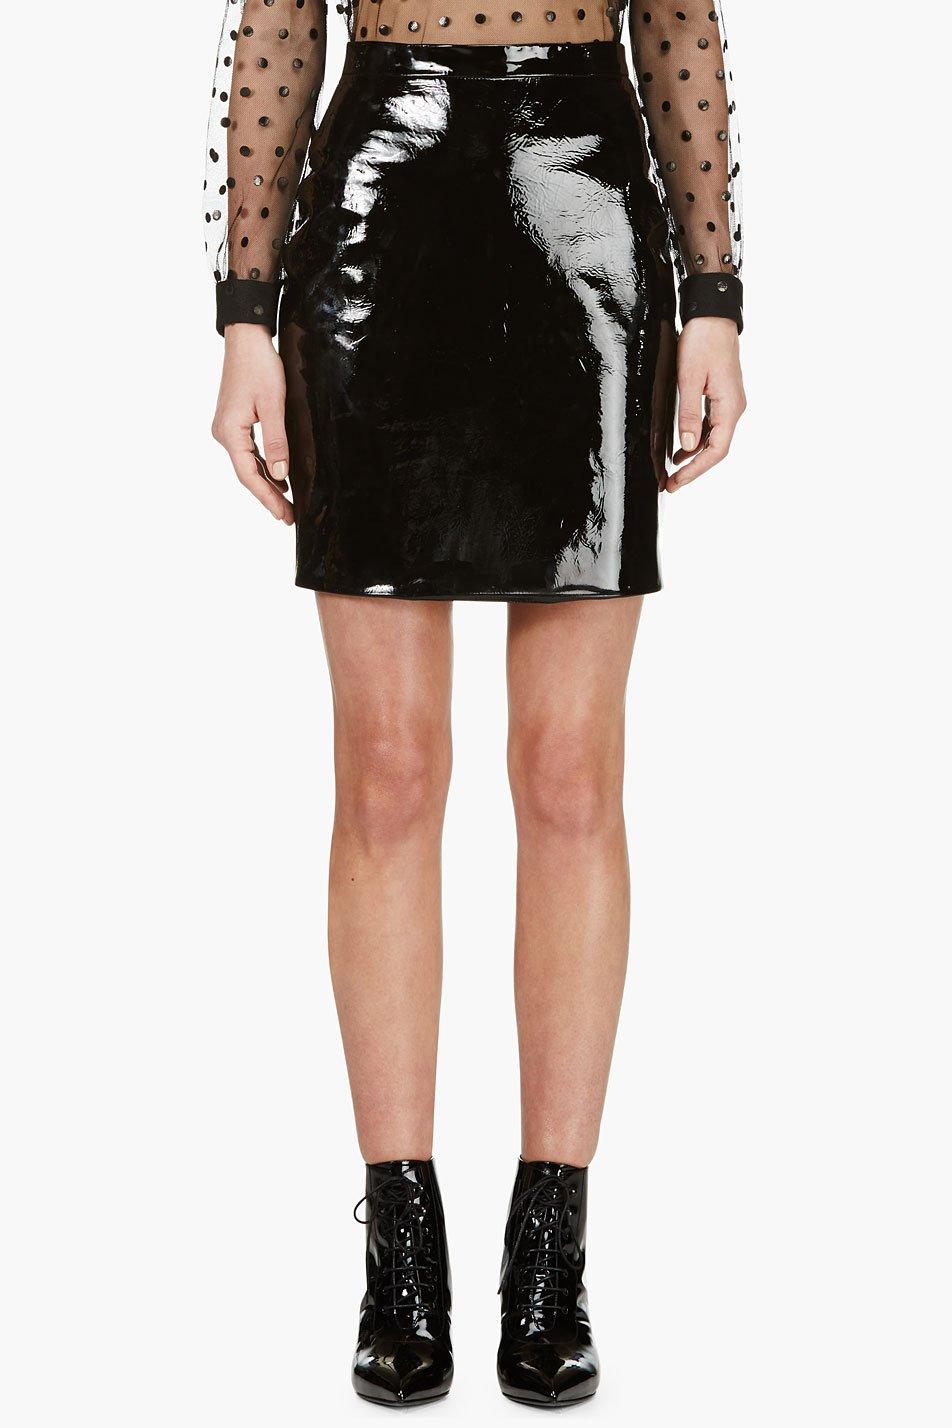 laurent black patent leather mini skirt